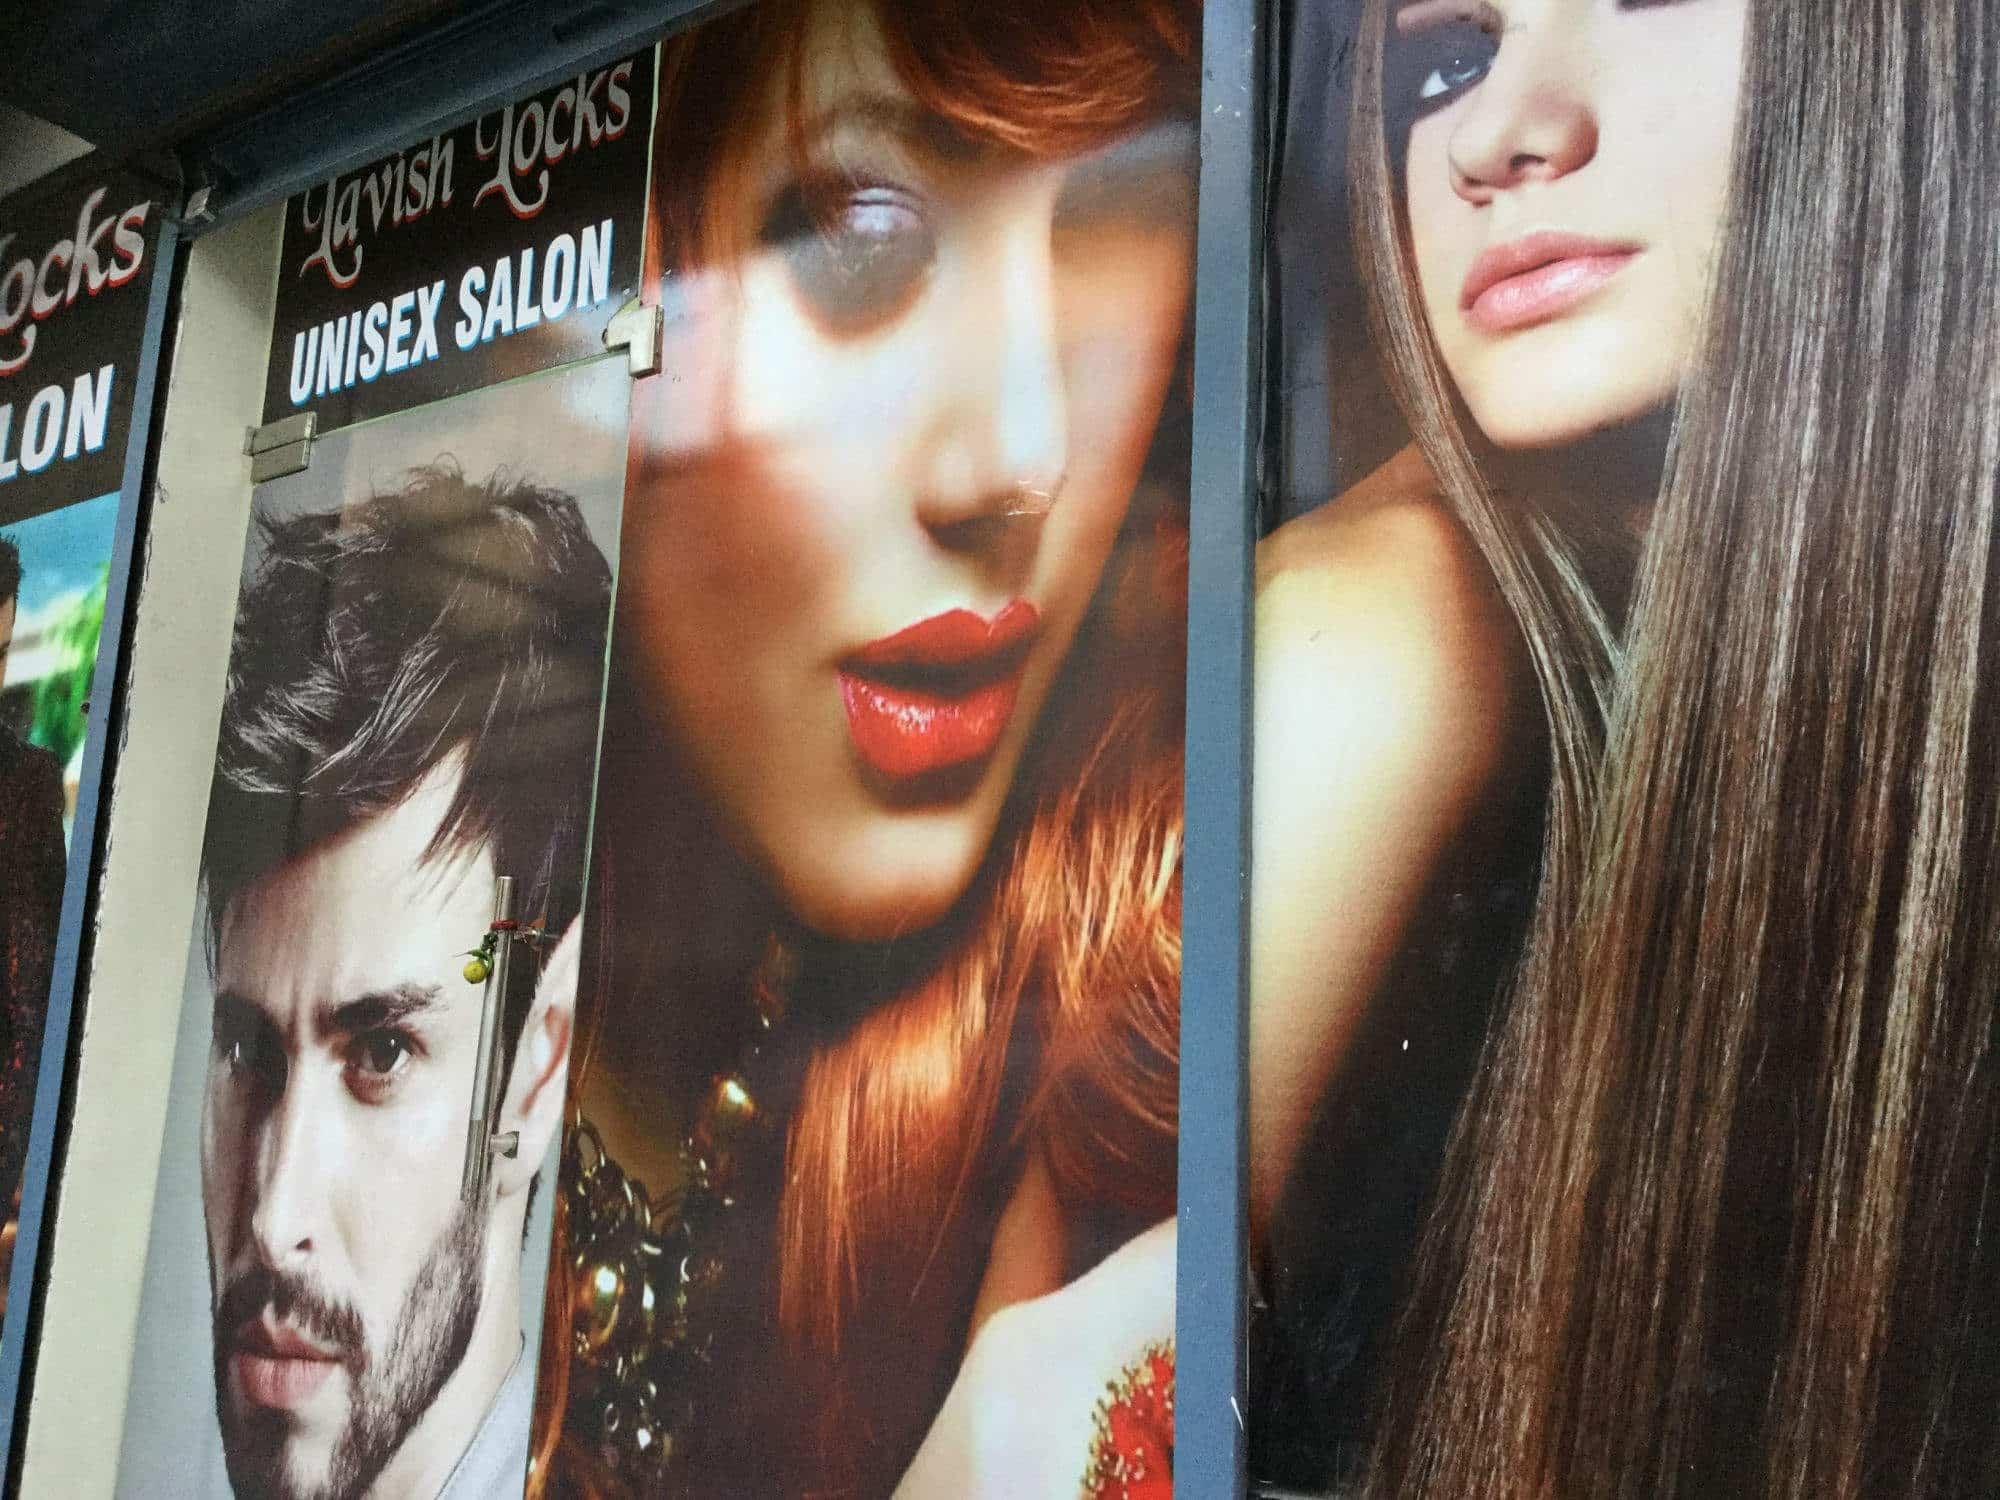 lavish looks unisex salon, rama park-uttam nagar - unisex salons in